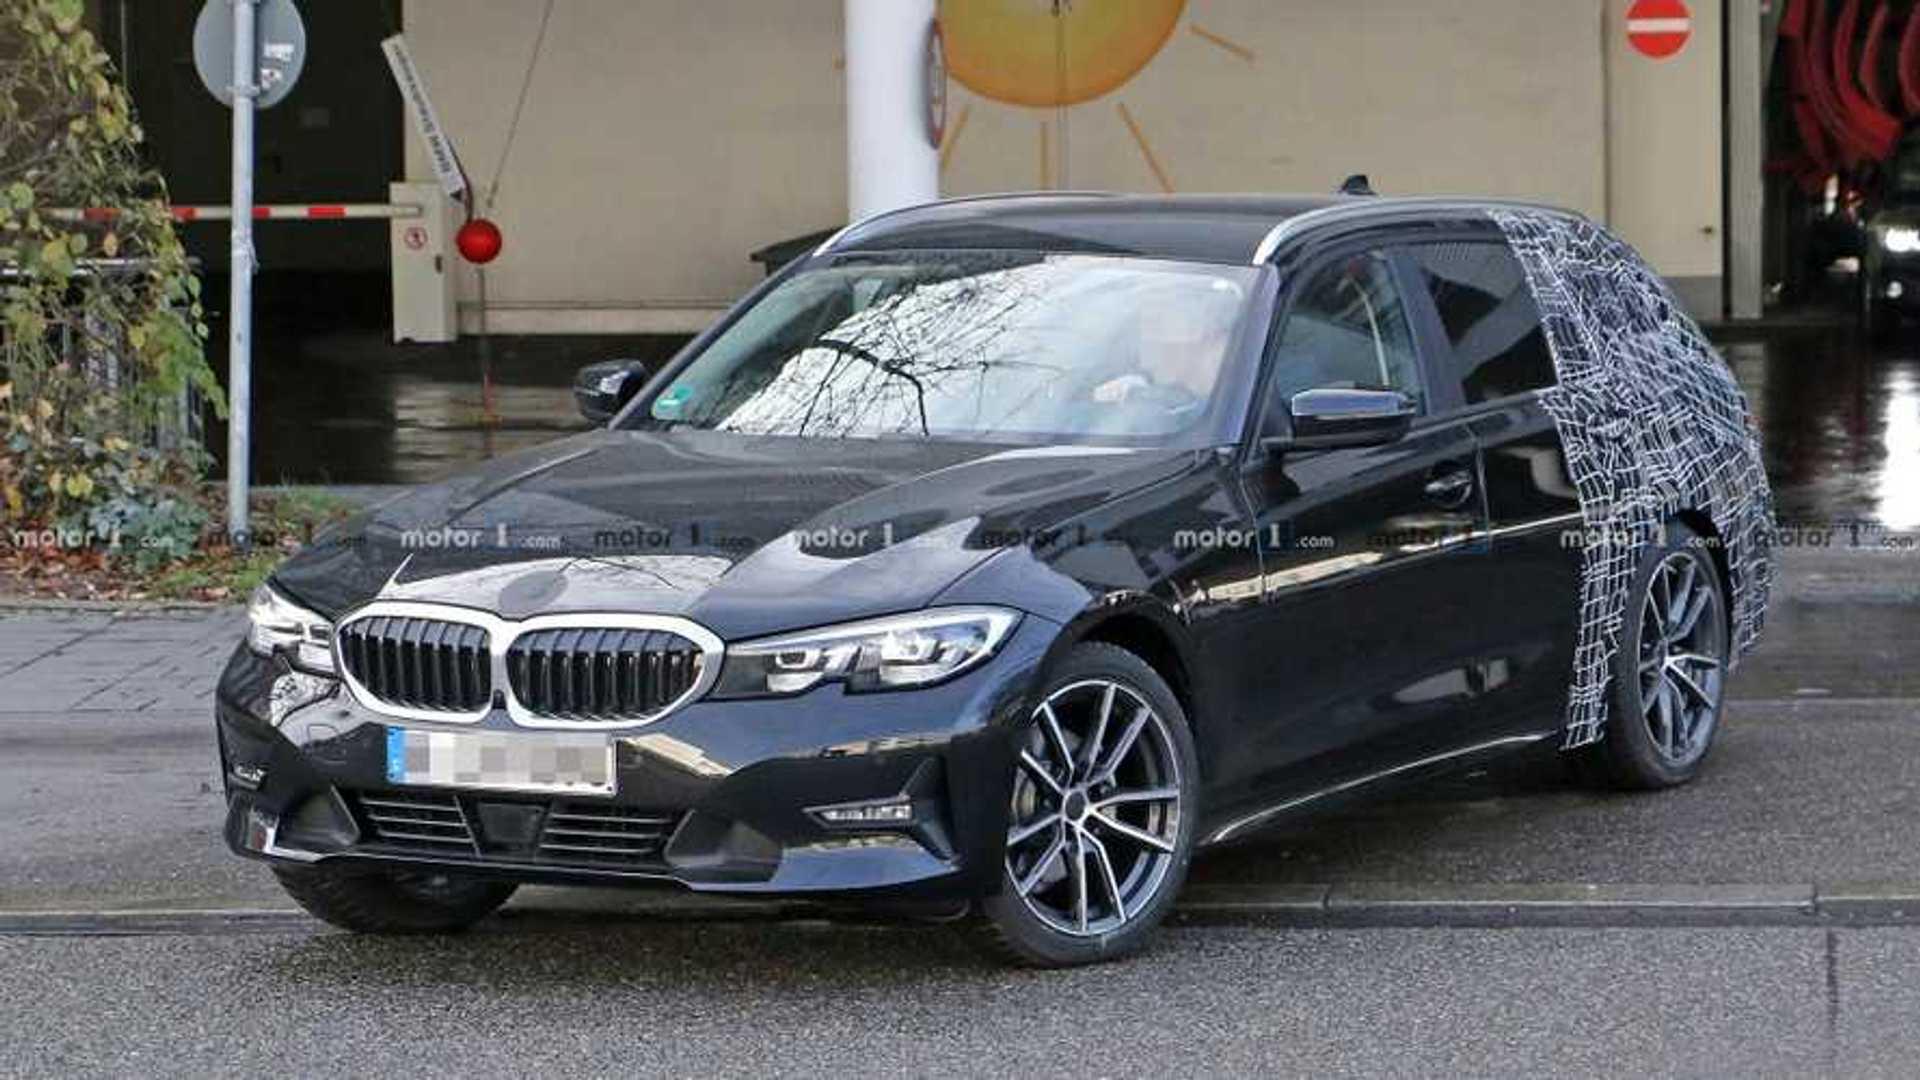 2018 - [BMW] Série 3 [G20/G21] - Page 29 Bmw-3-series-touring-spy-shots